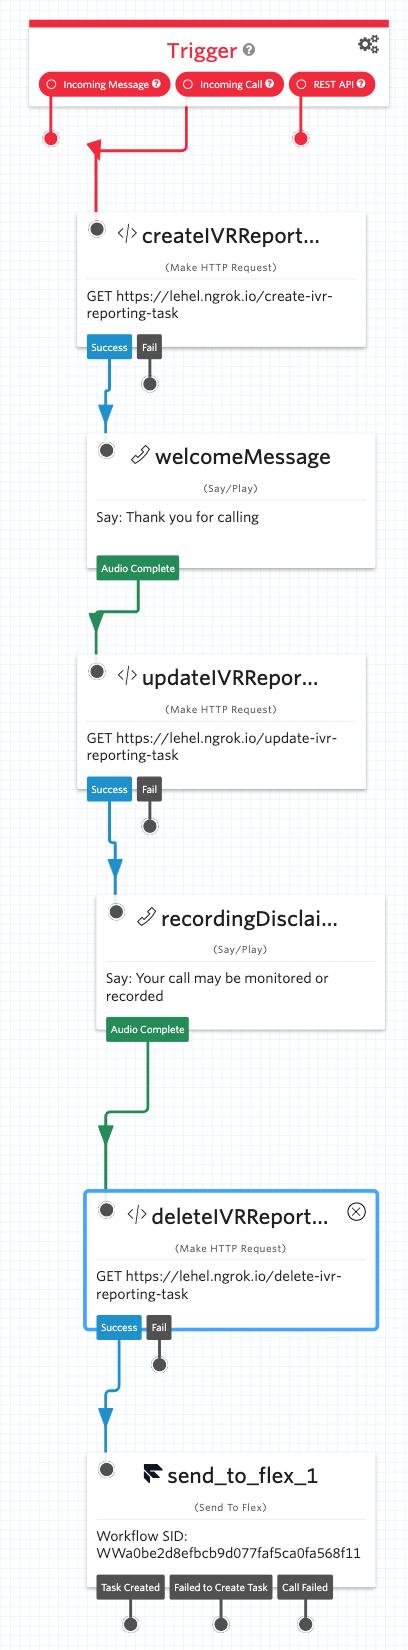 IVR Reporting Studio Flow